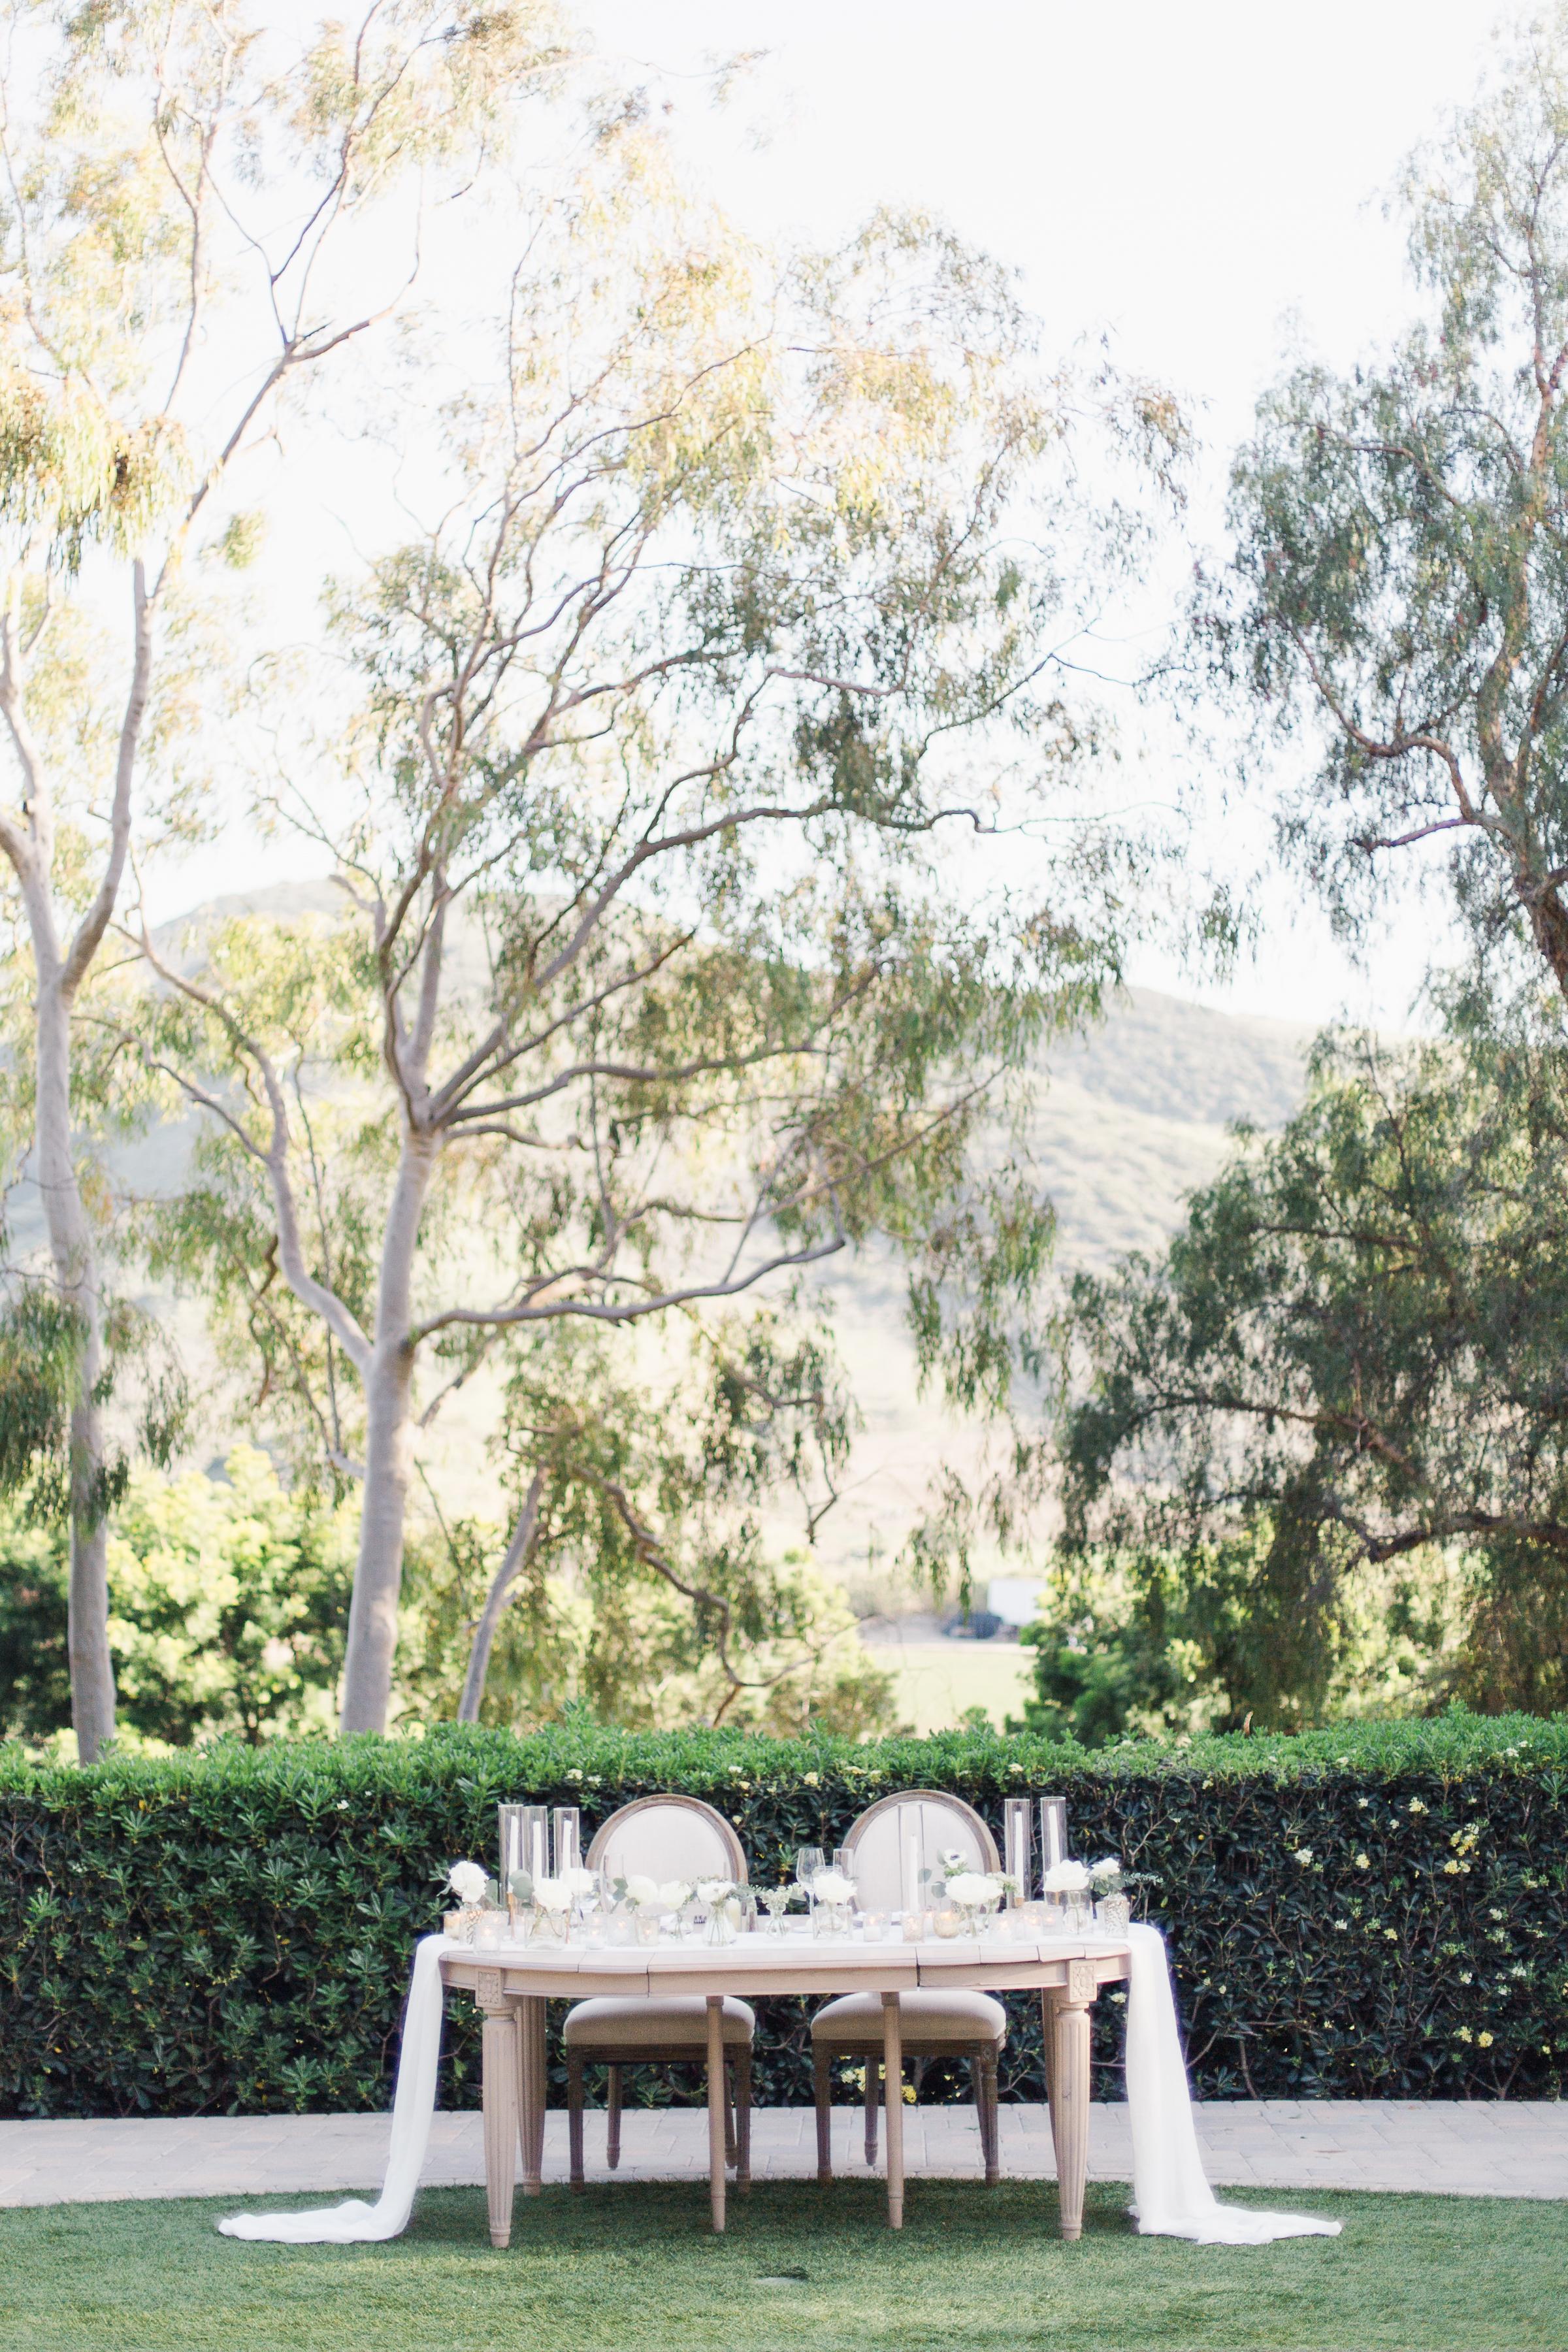 maravilla-gardens-camarillo-los-angeles-ca-california-wedding-pictures-pic0710.jpg